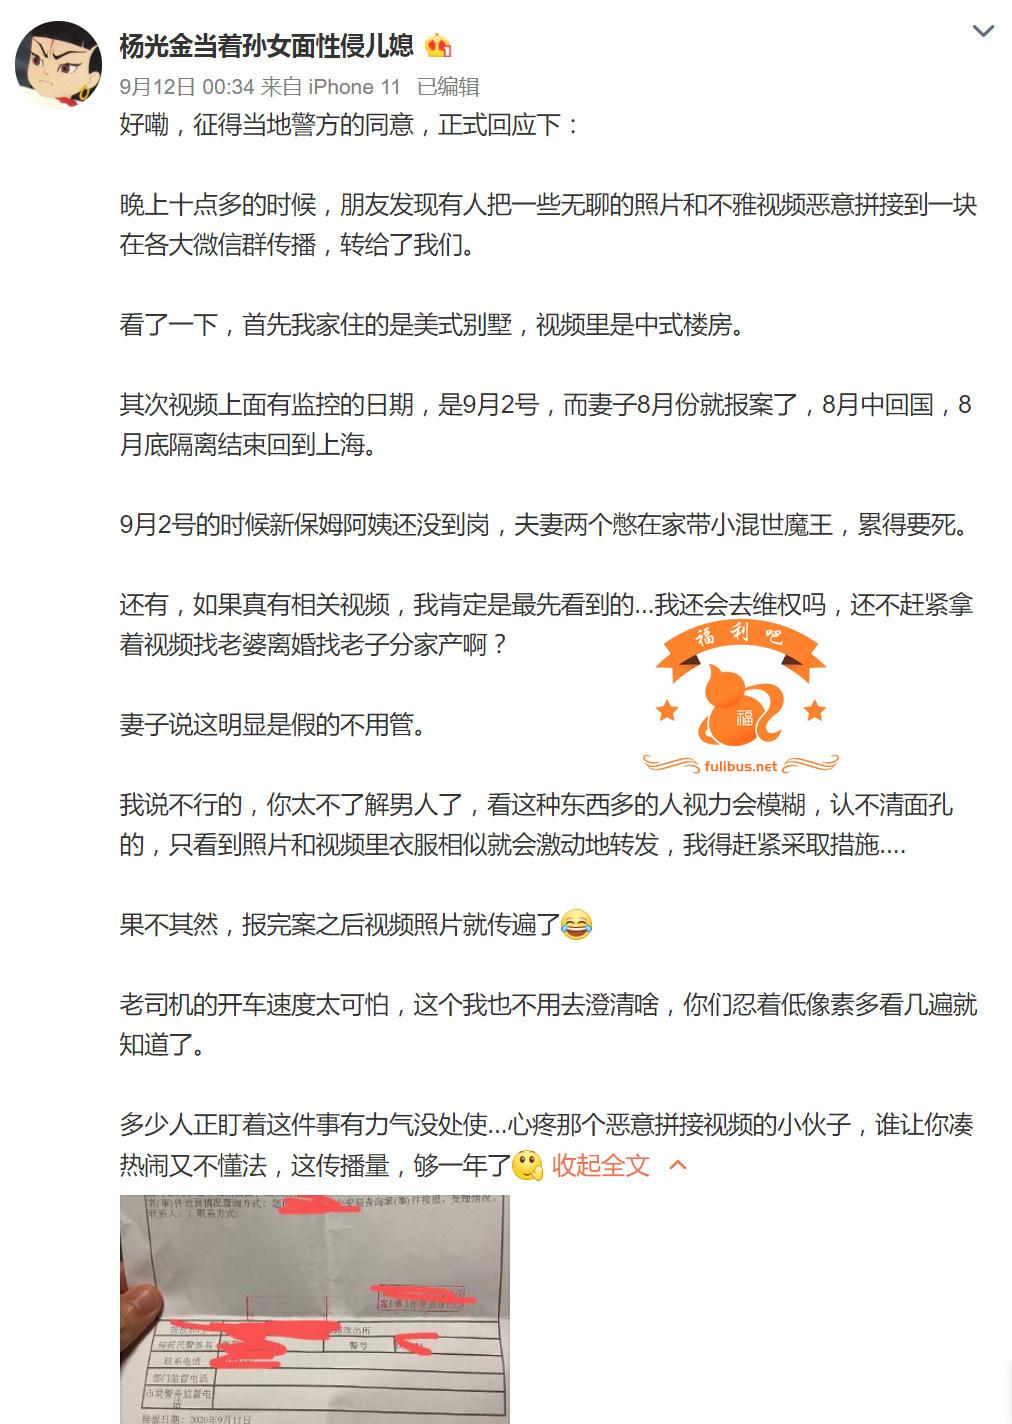 fulibus.net福利吧2020-09-13_01